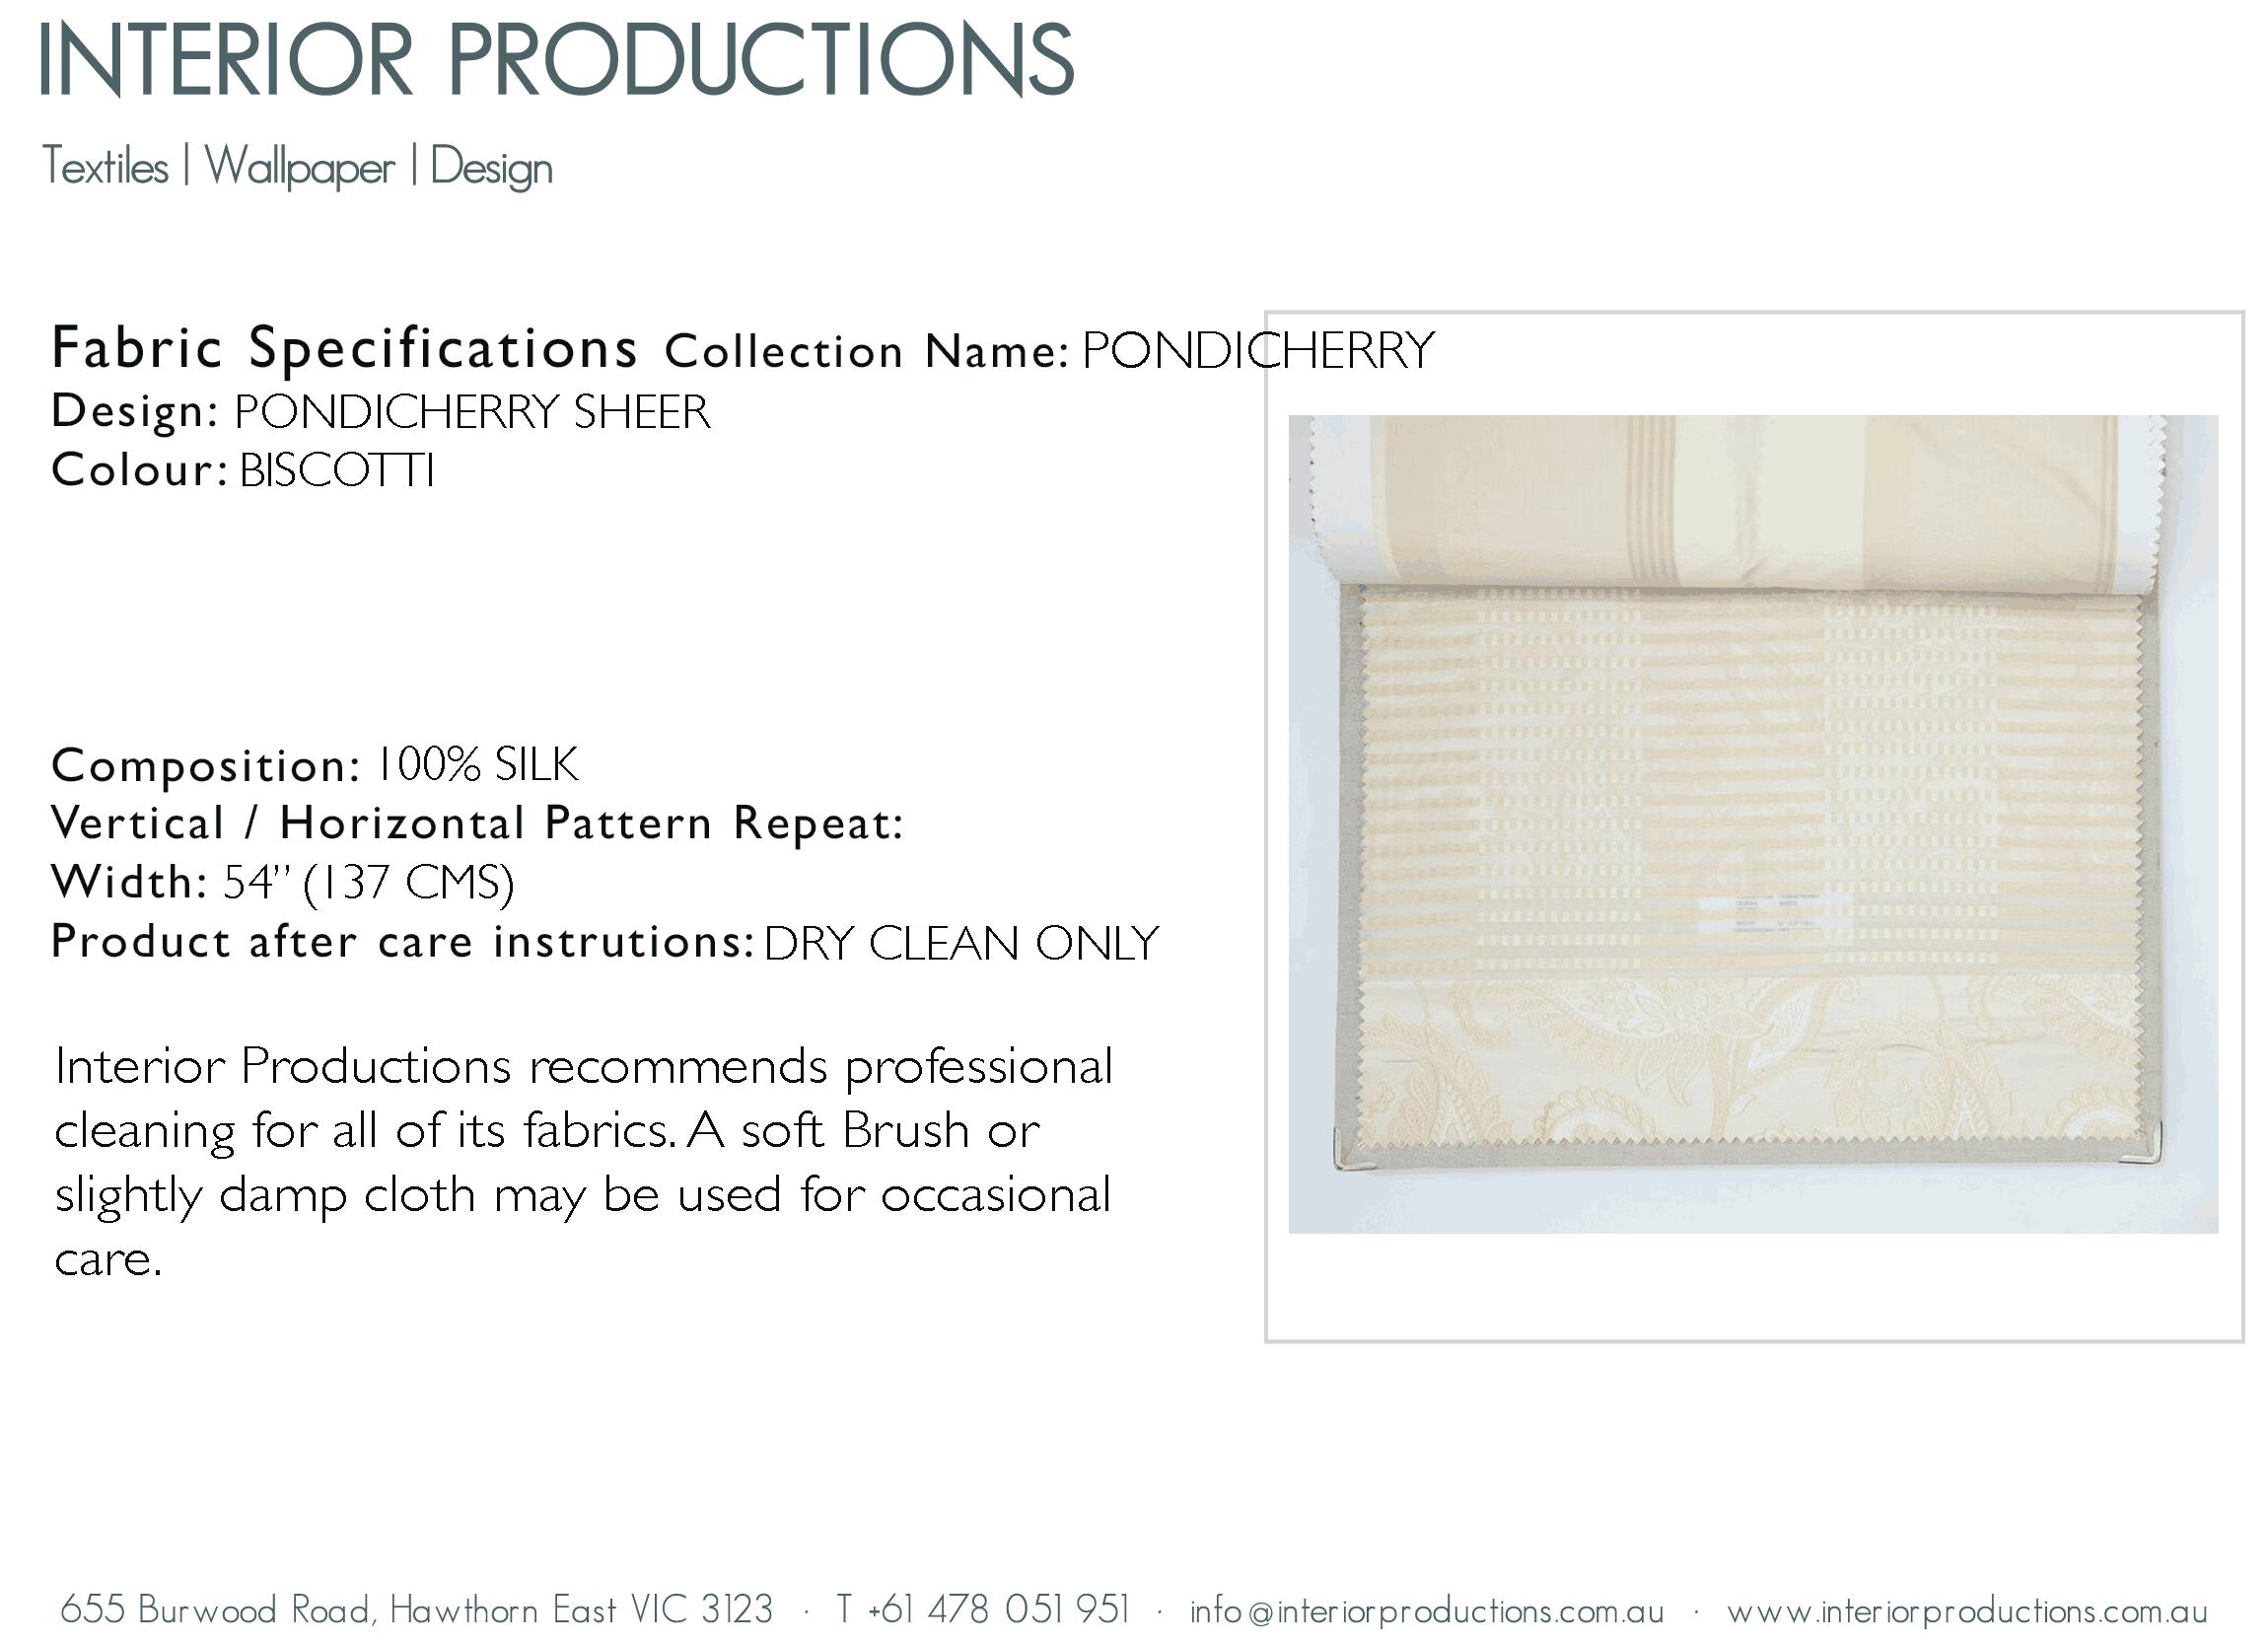 interior_productions_PONDICHERRY-SHEER---BISCOTTI